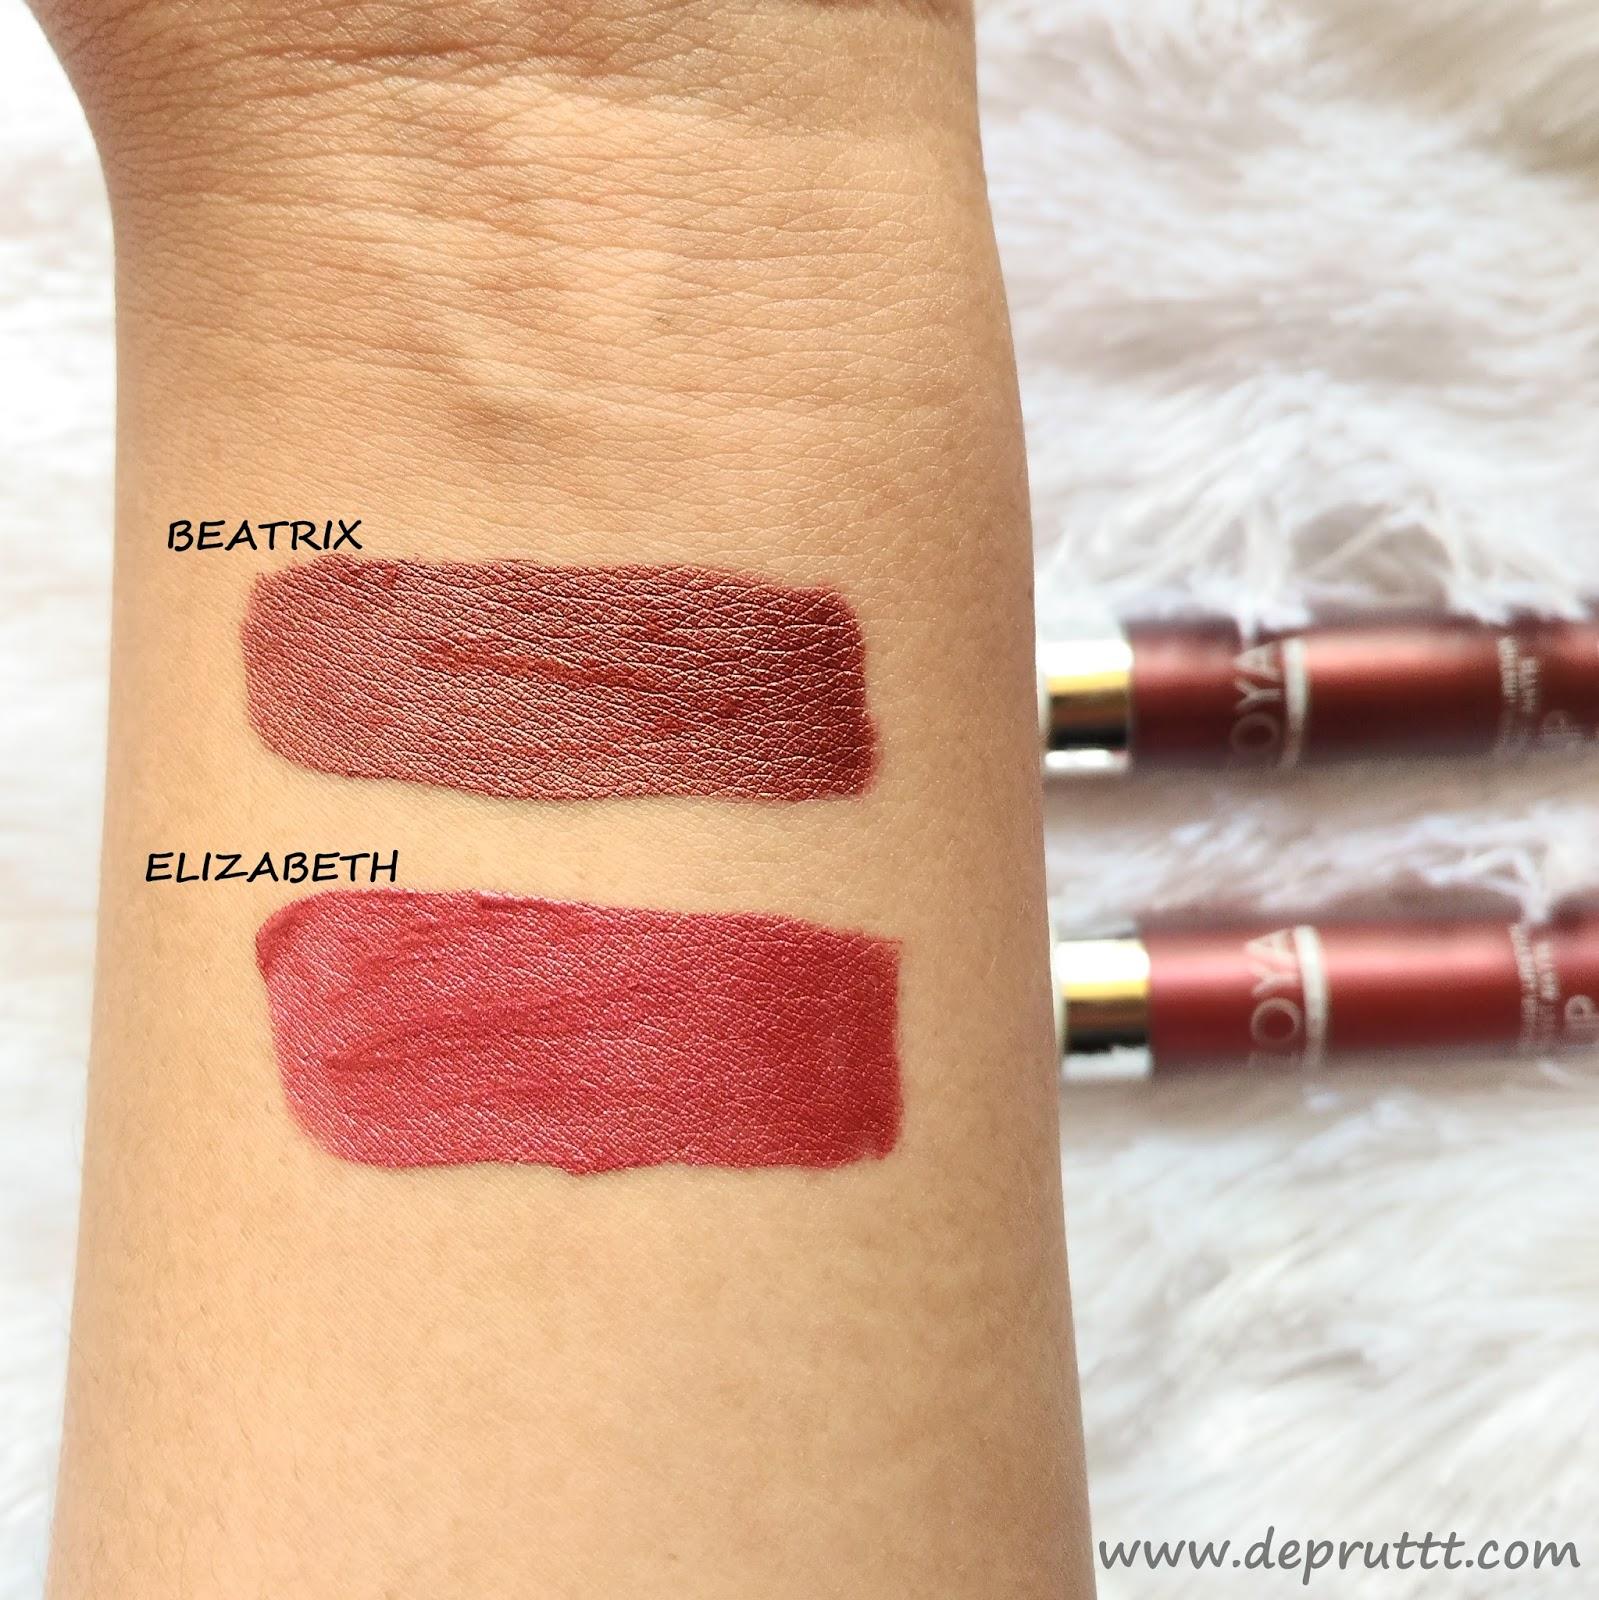 Devi Purwati Review Zoya Cosmetics Metallic Lip Paint Untuk Masalah Warna Aku Sudah Sedikit Memberi Clue Diawal Tadi Jadi Buat Kalian Yang Pergi Ke Pesta Cocok Banget Pakai Soalnya Lipsticknya Ada Glitter Nya